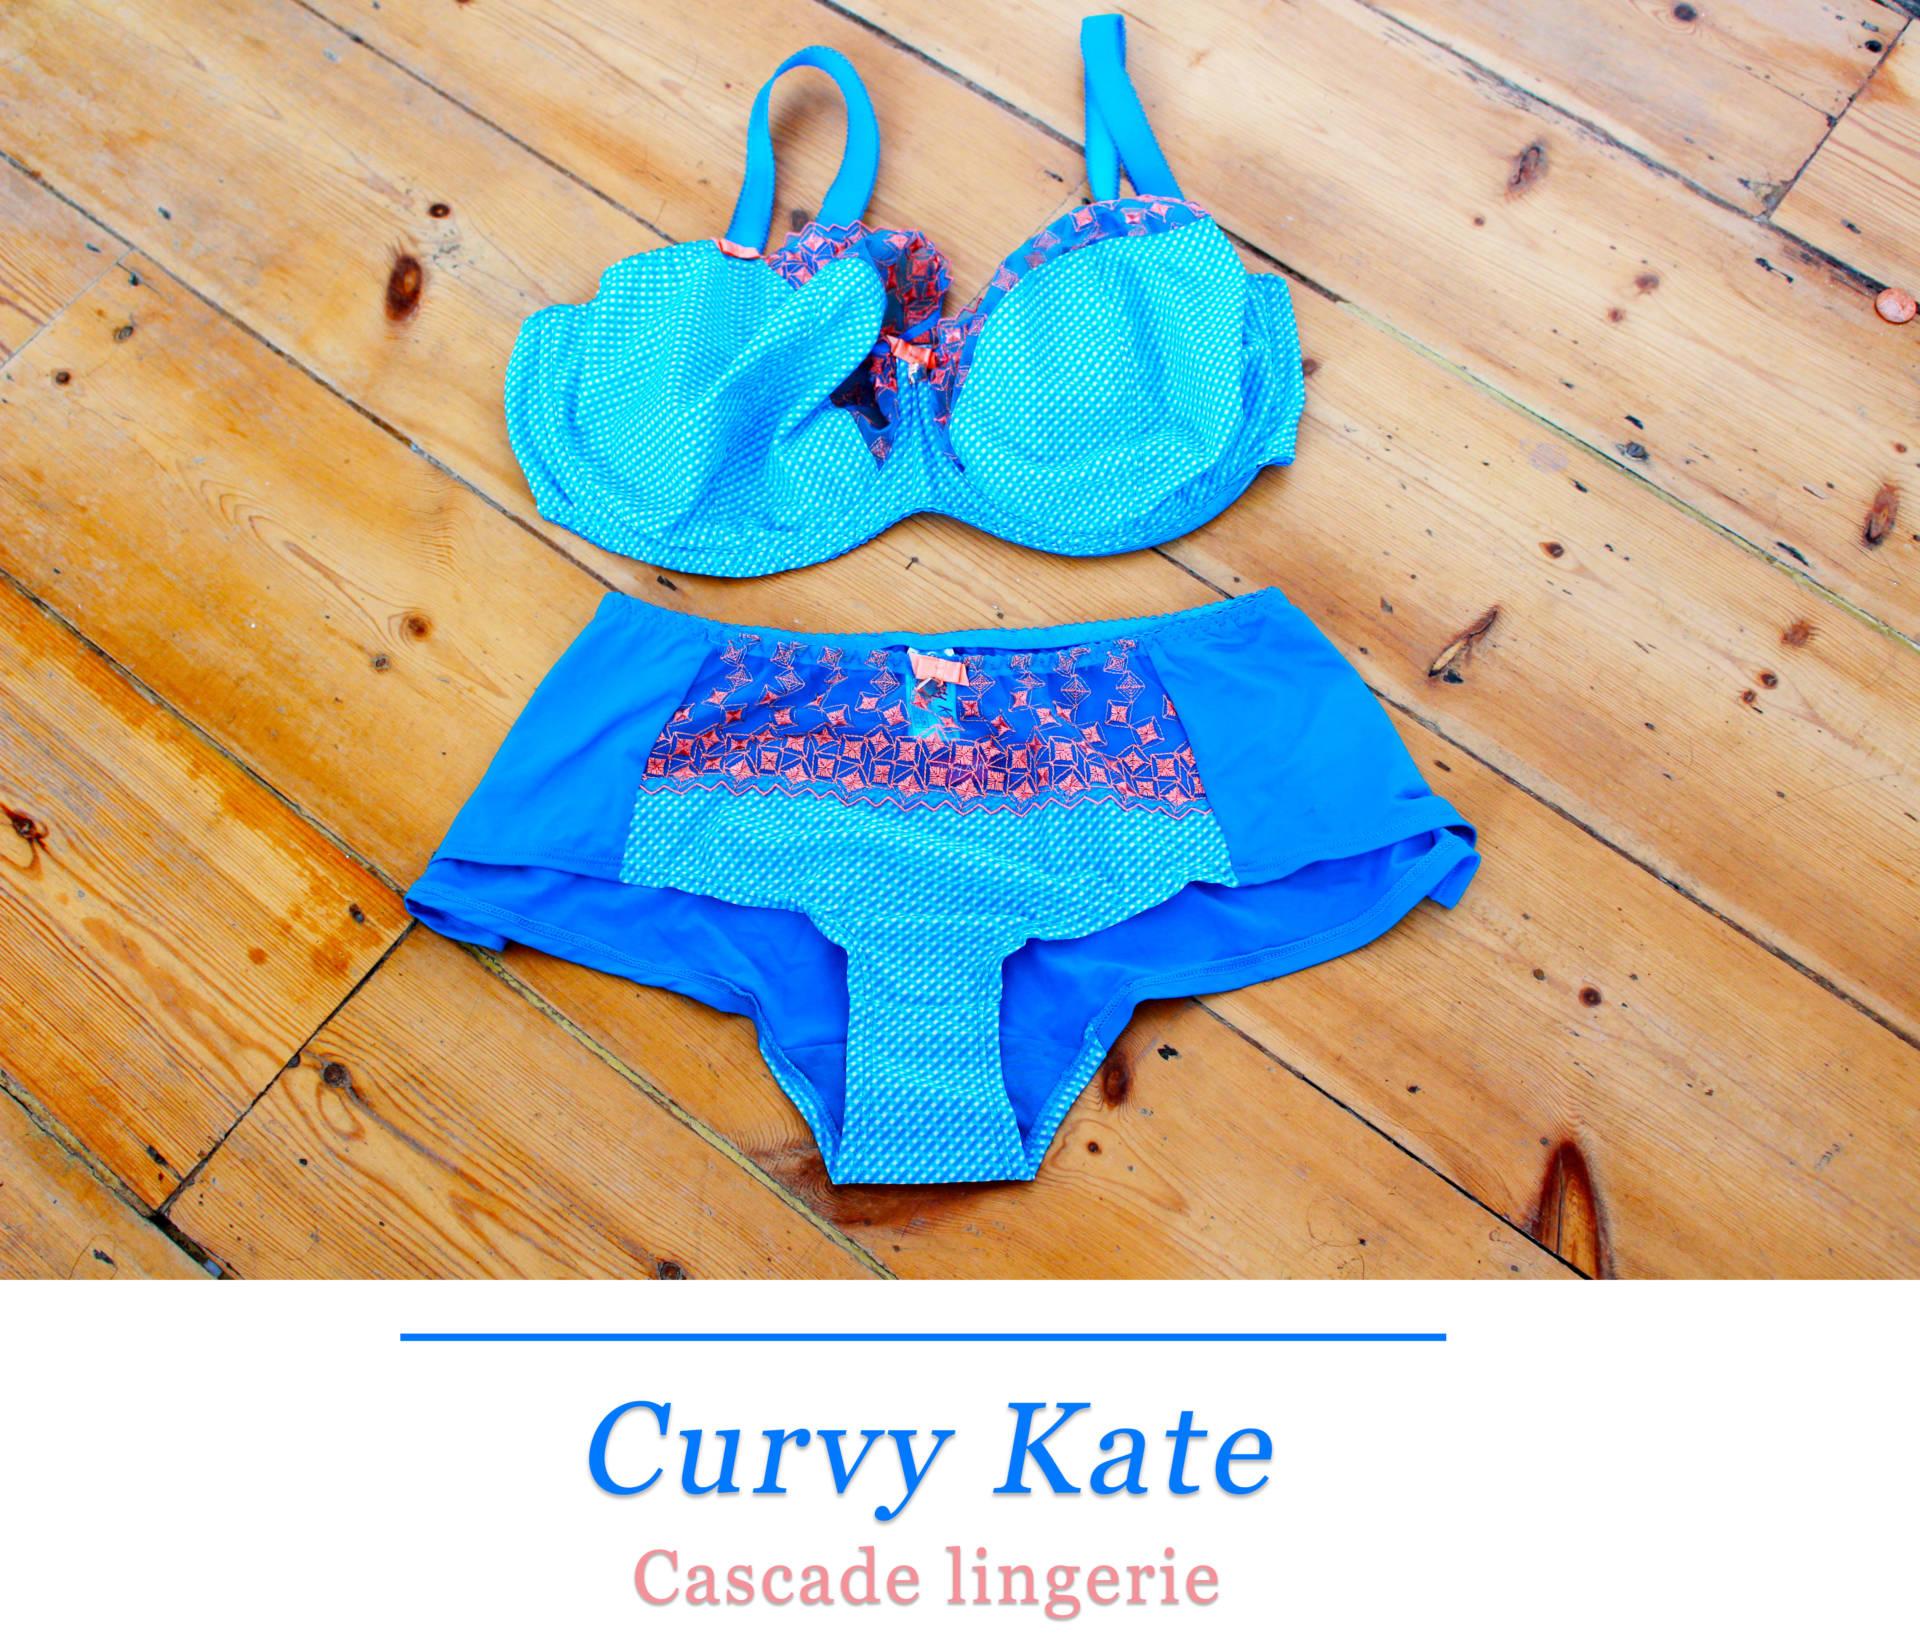 Curvy Kate Cascade